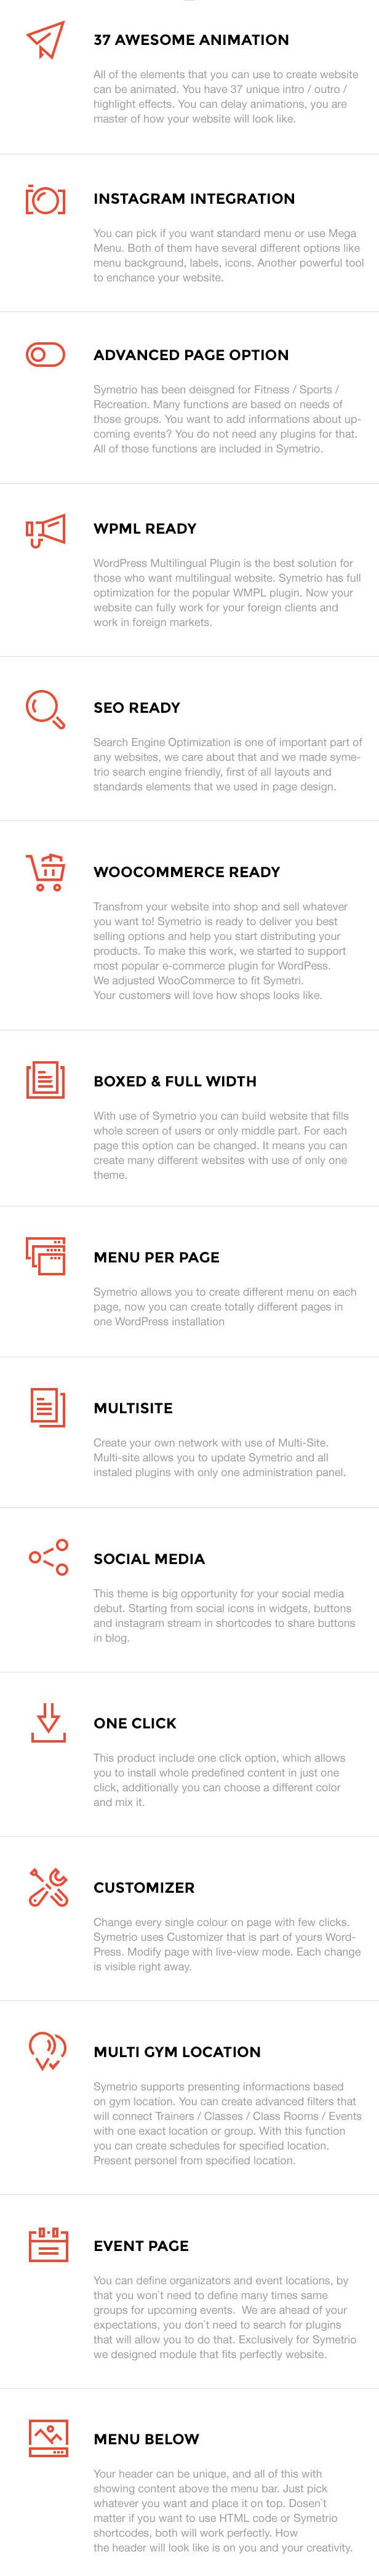 Symetrio - Gym & Fitness WordPress Theme - 5